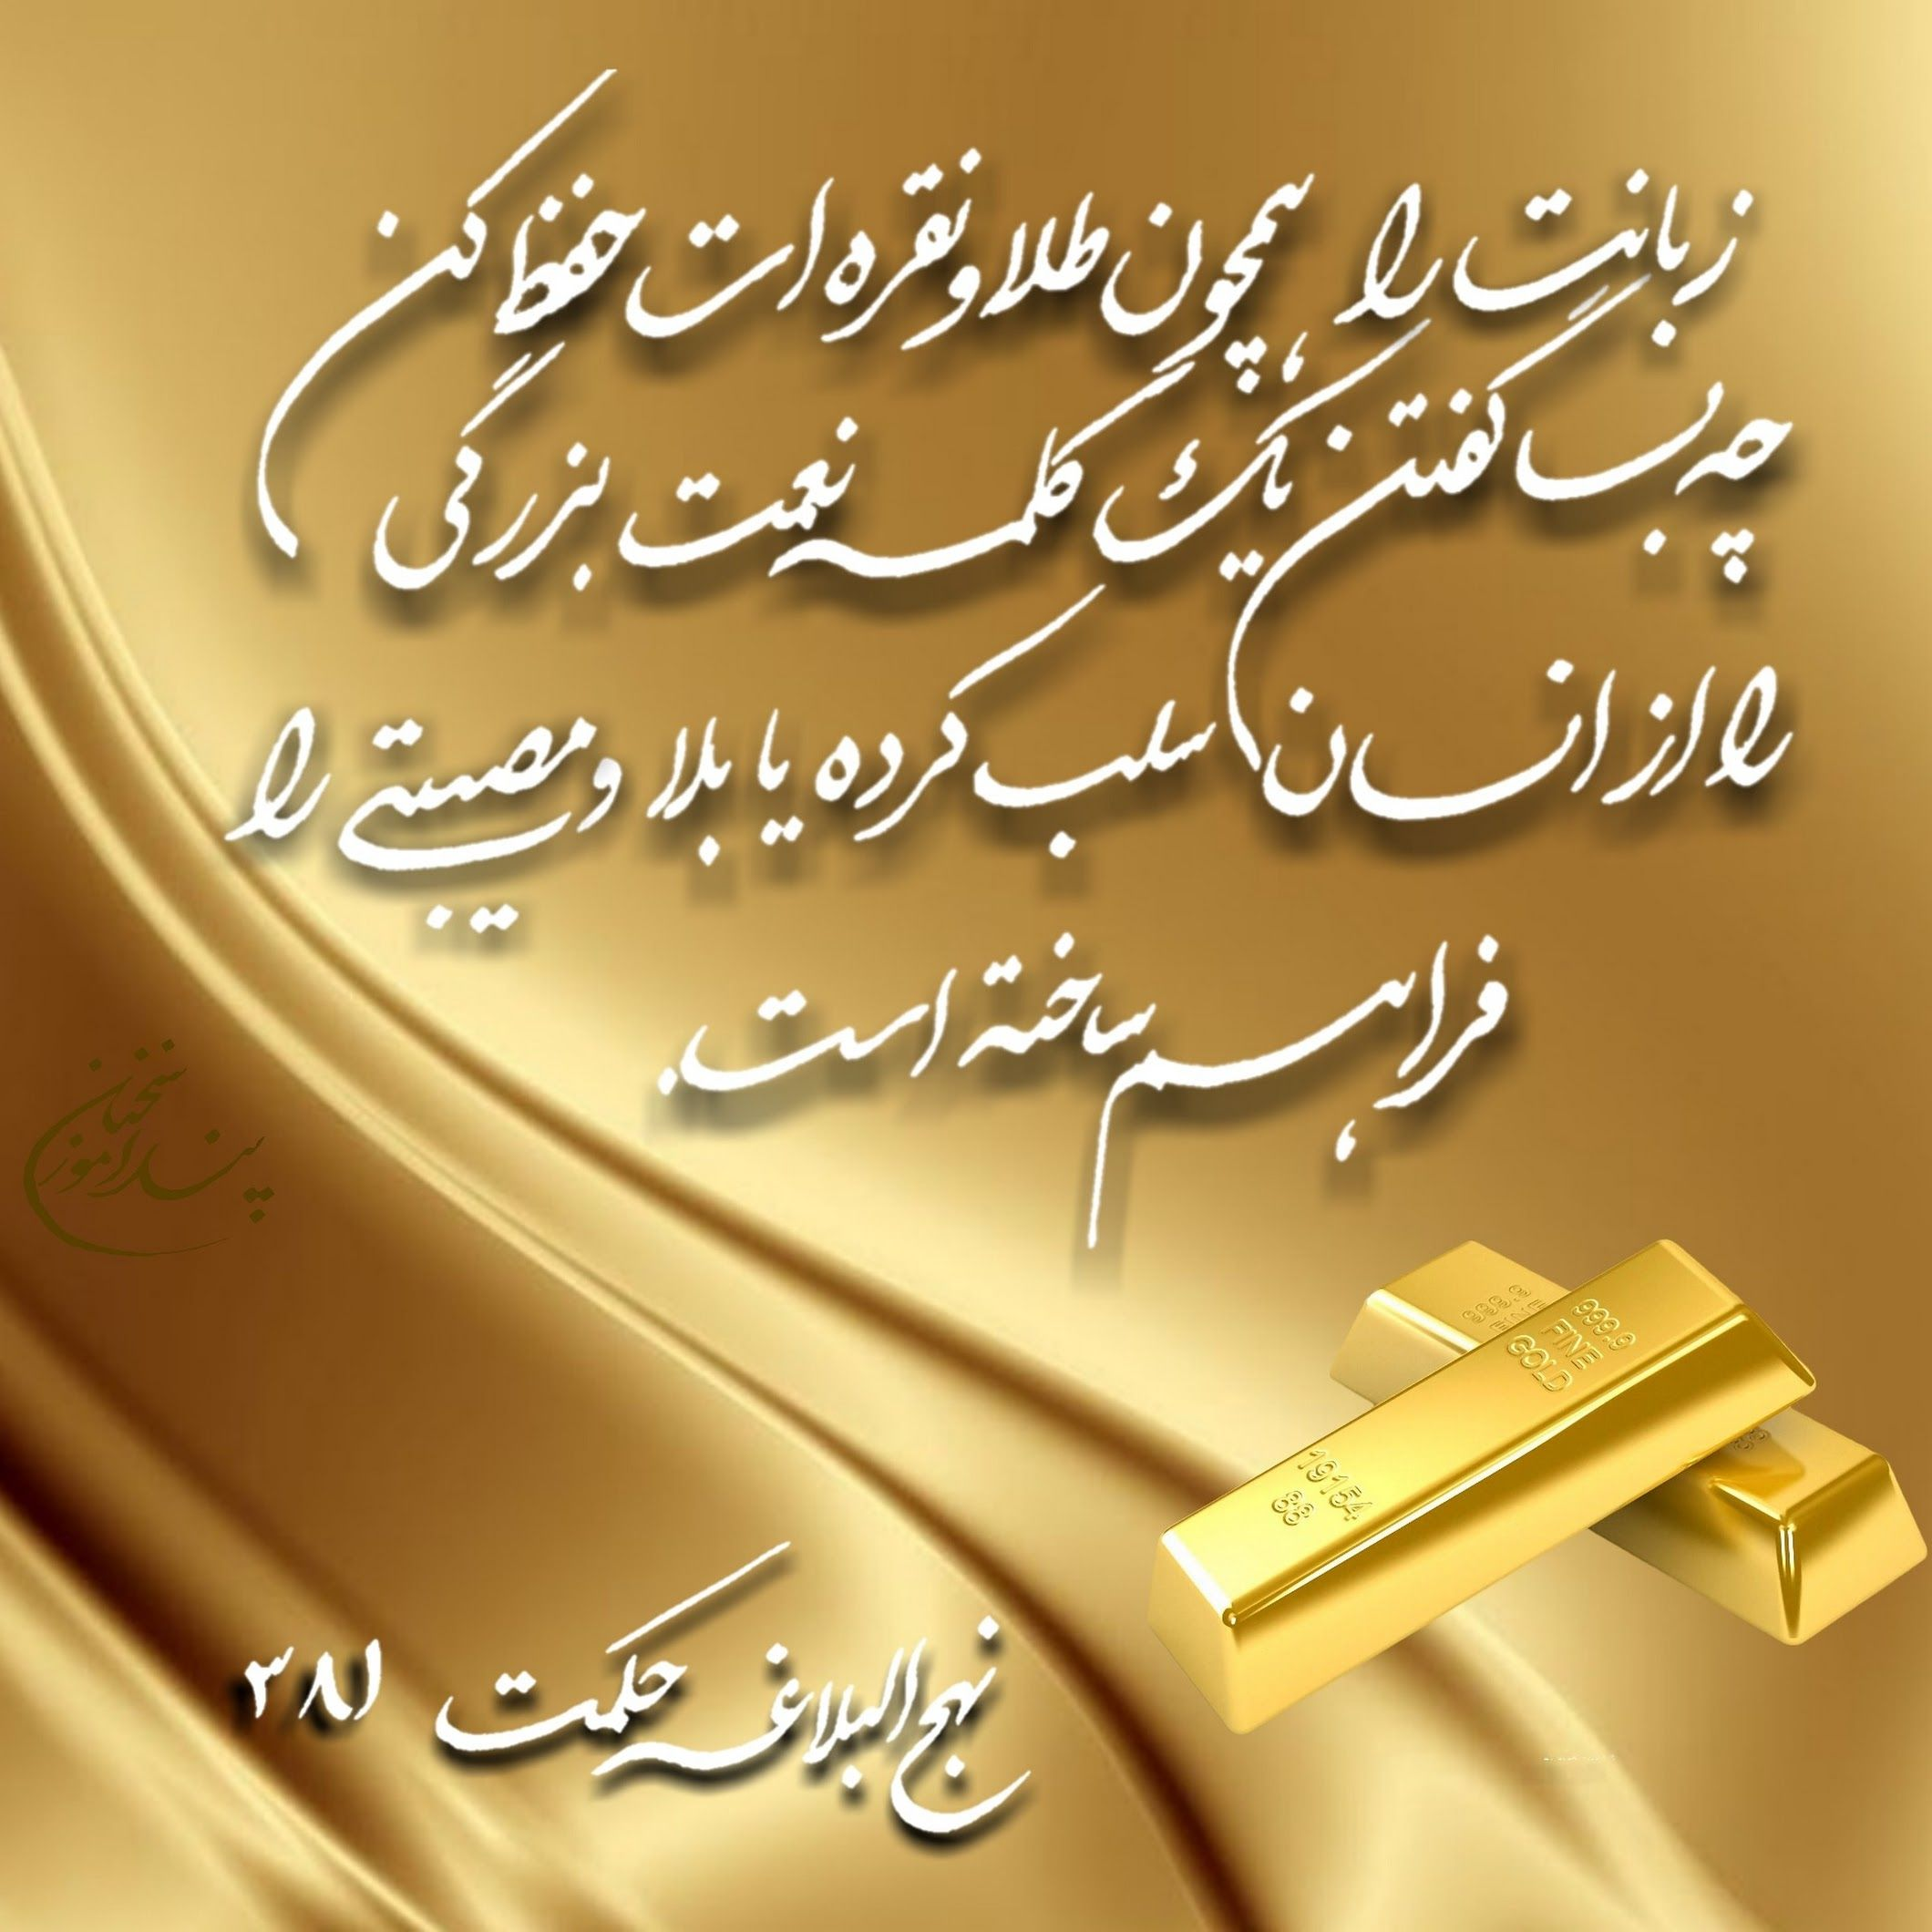 Sign In Farsi Poem Study German Poems